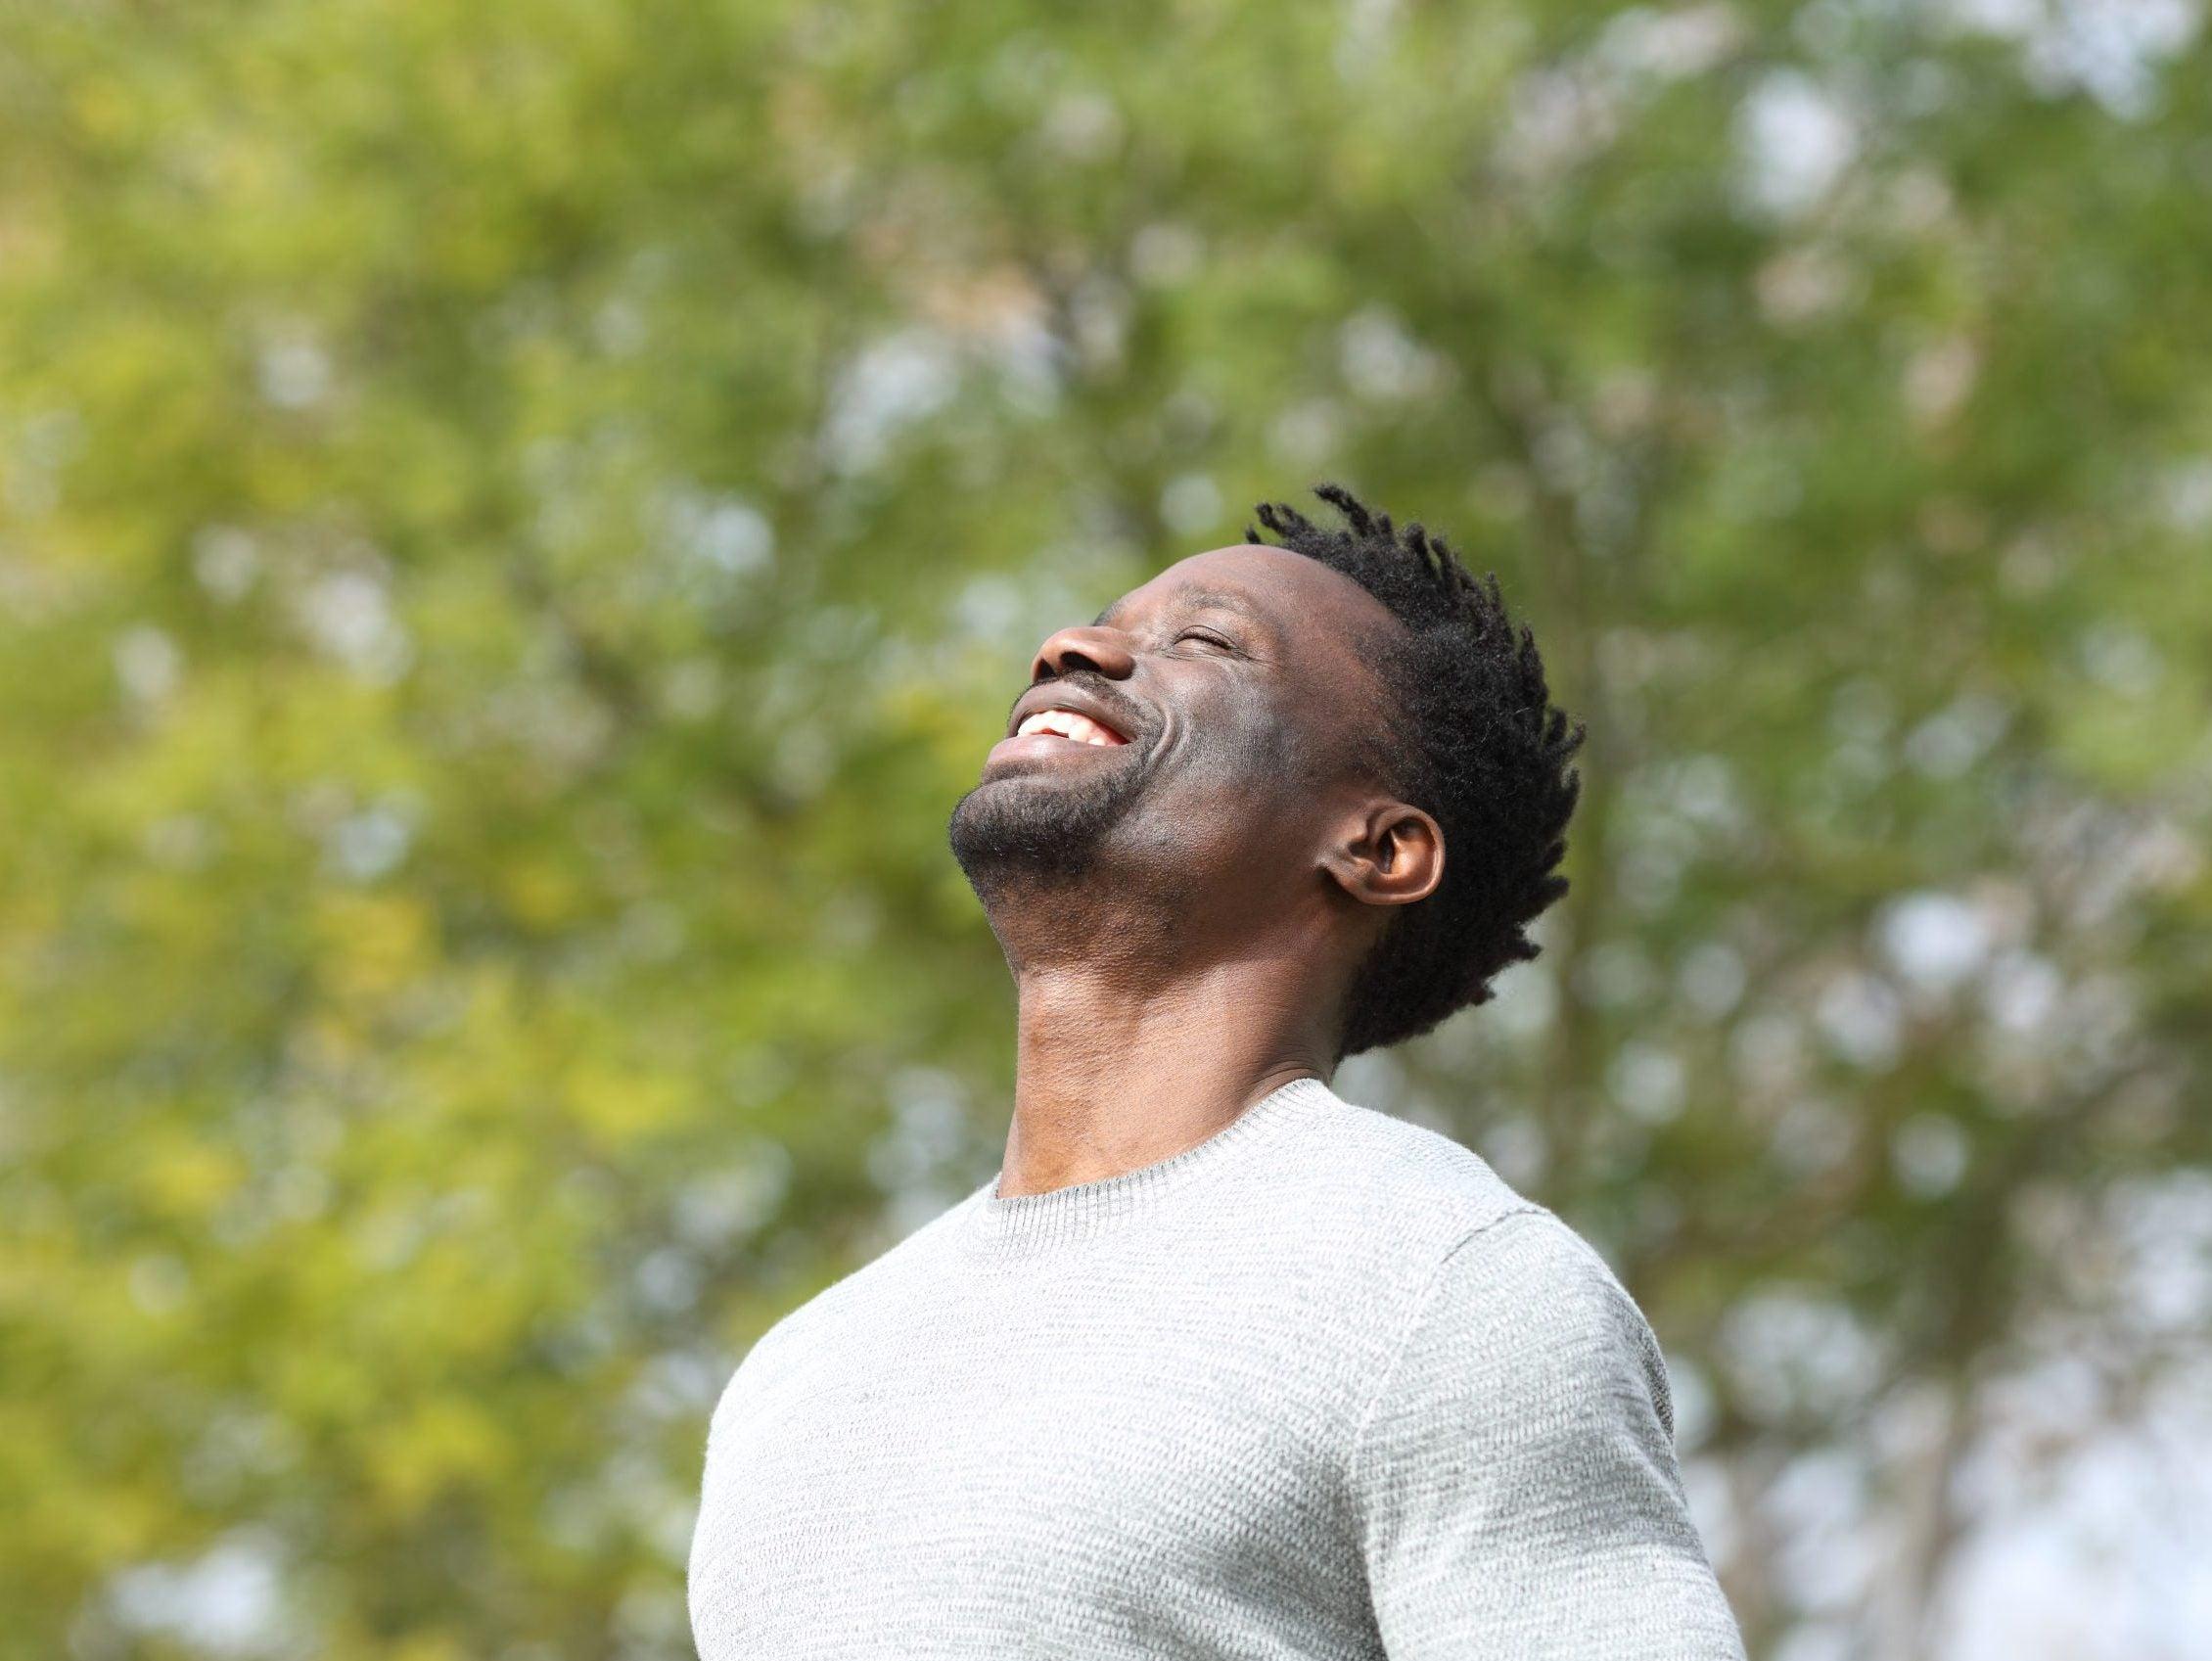 Happy,Black,Man,Breathing,Deeply,Fresh,Air,In,A,Park